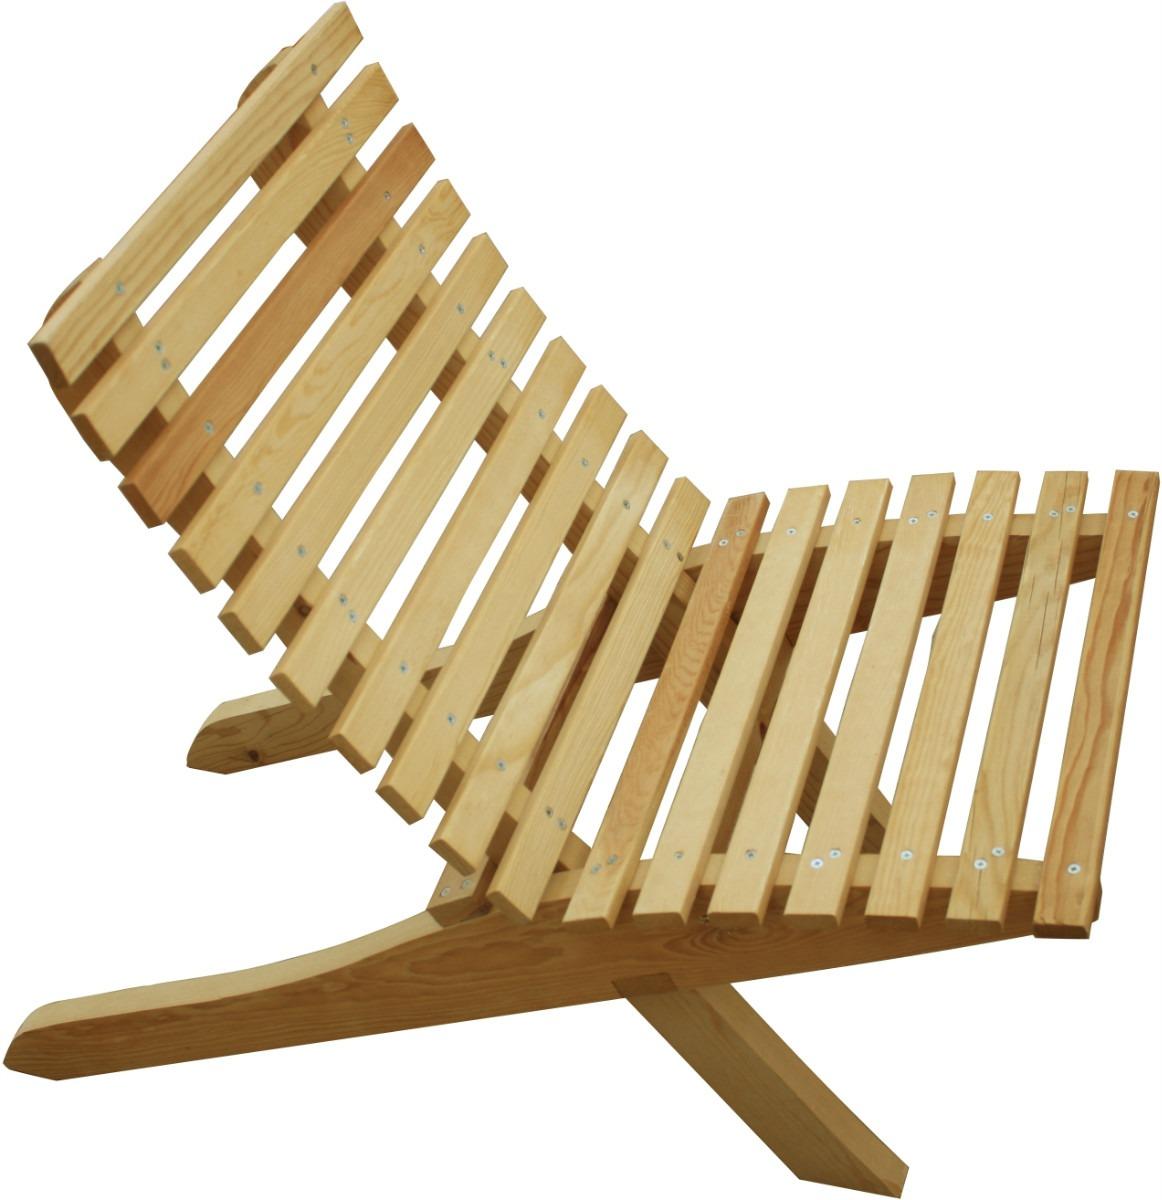 Silla mueble plegable madera jardin o interiores 449 for Sillas de madera precios